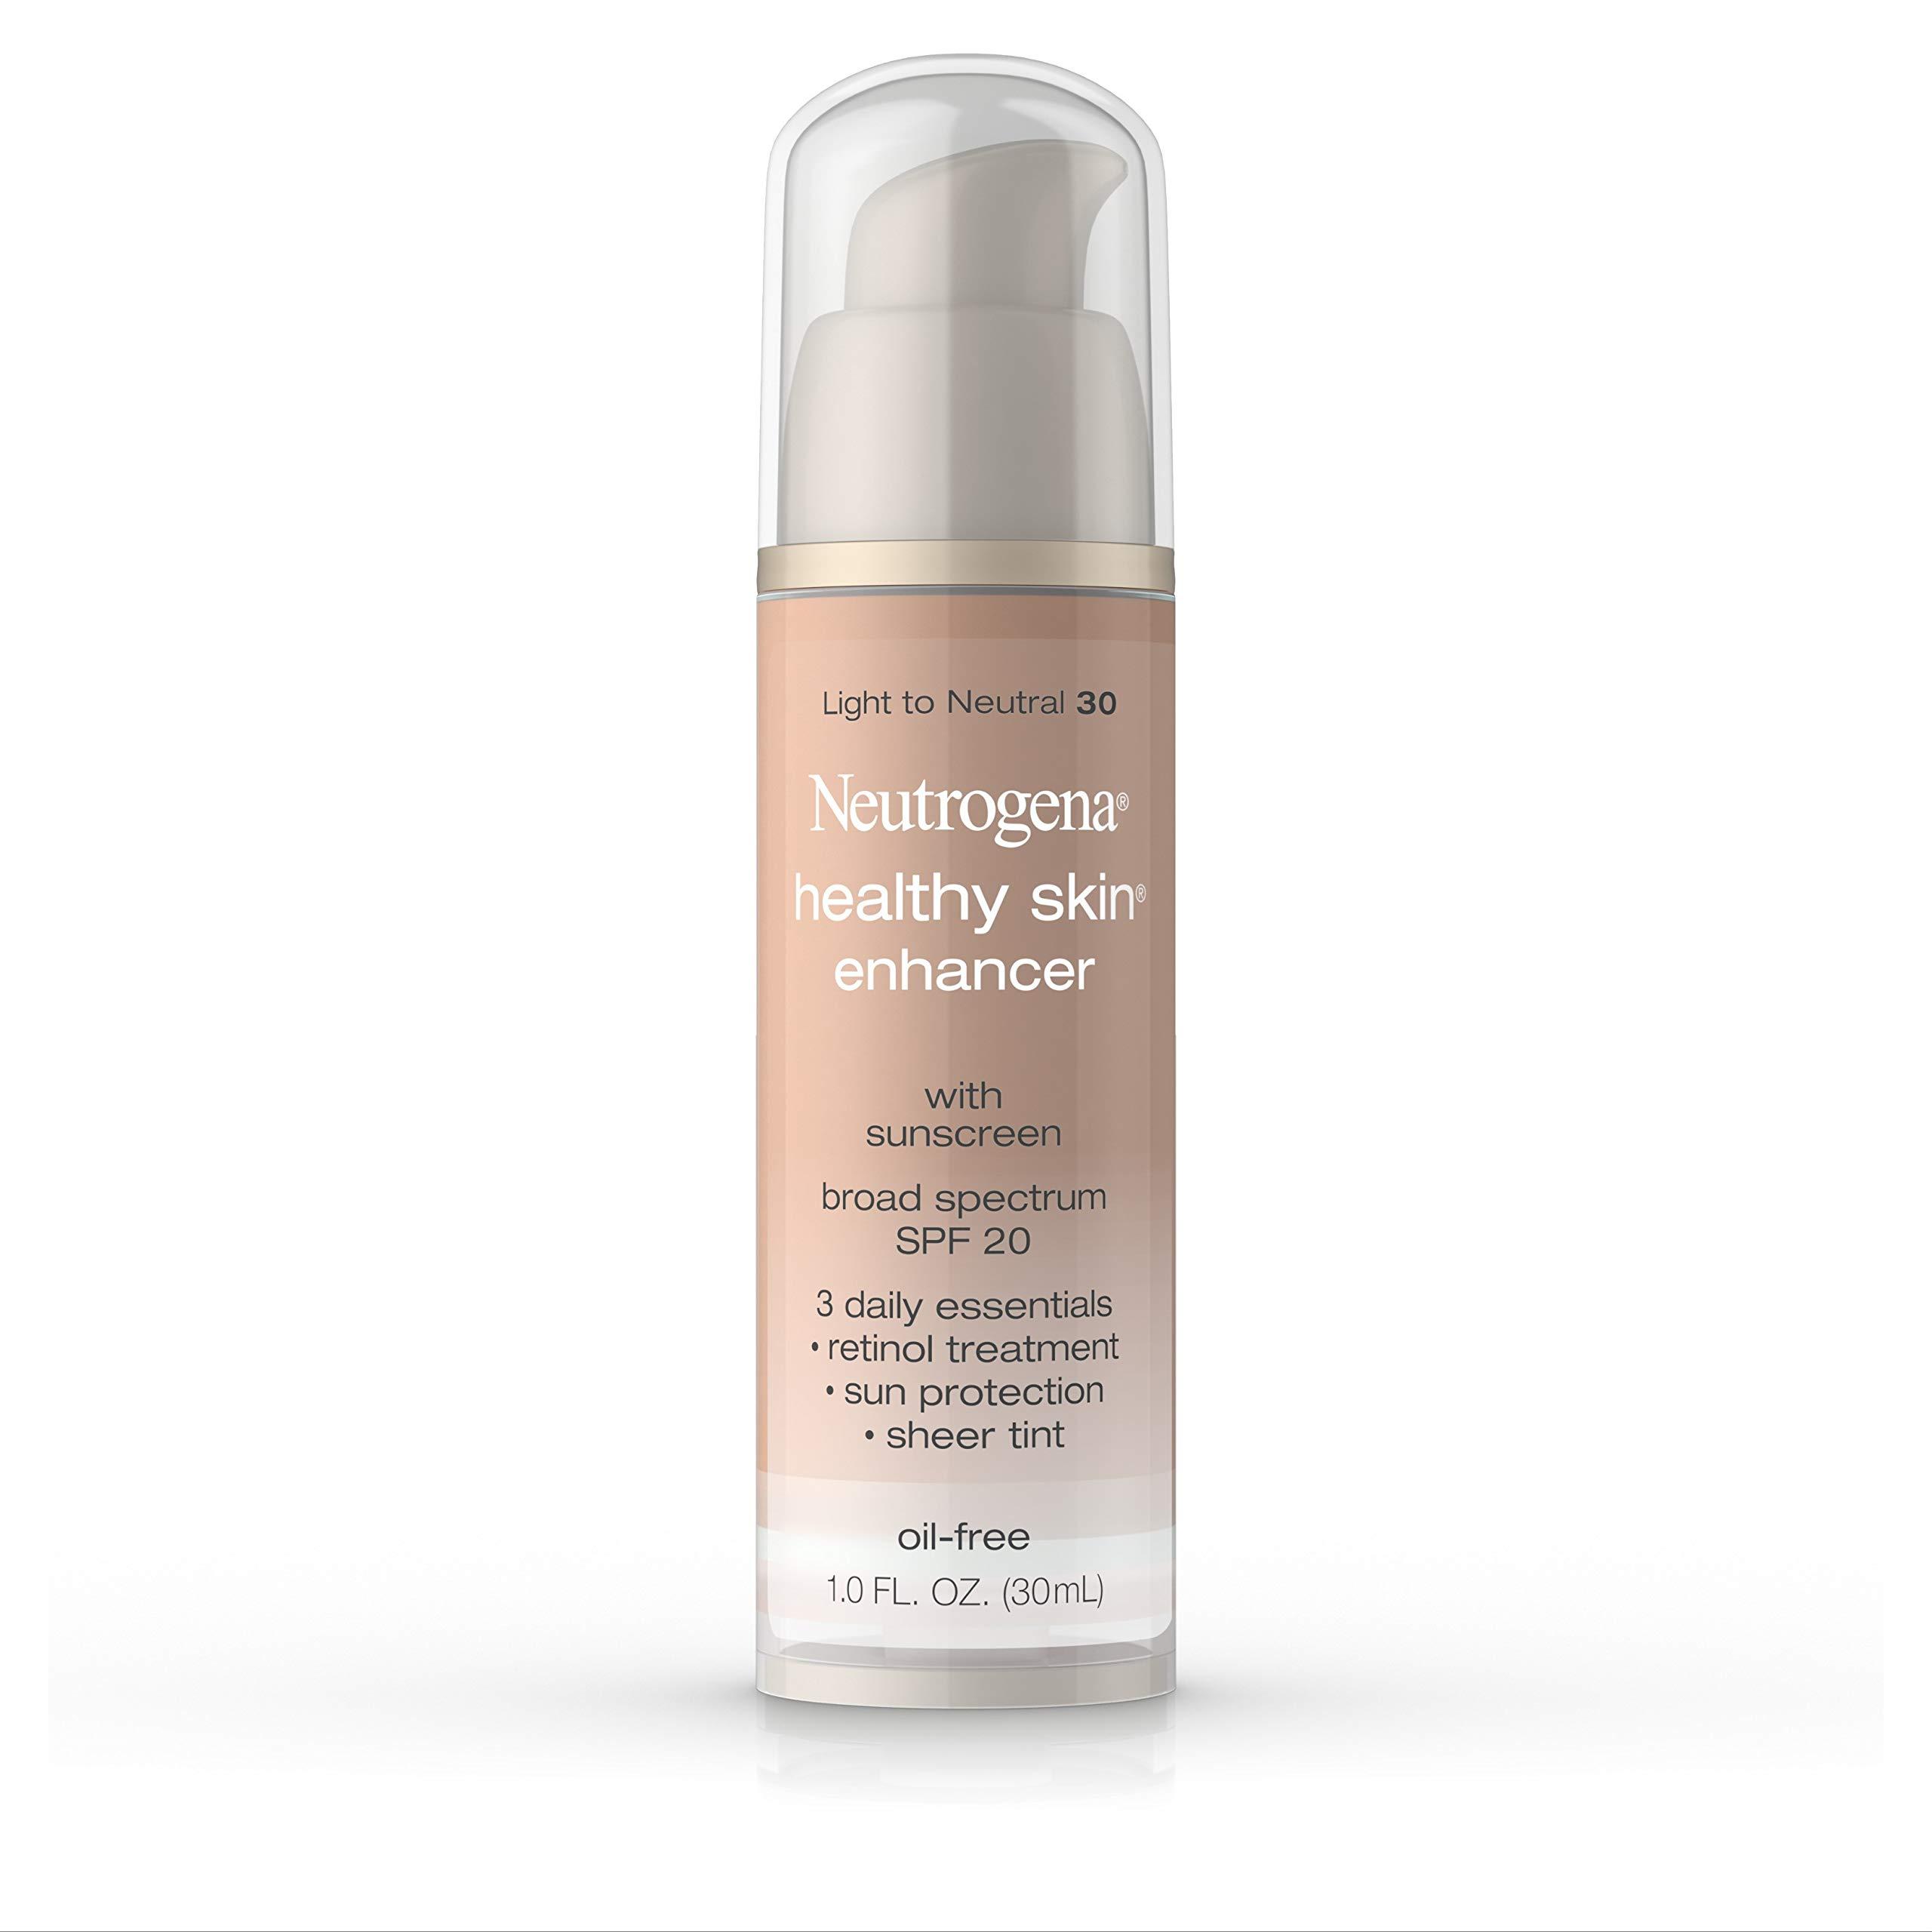 Neutrogena Healthy Skin Enhancer, Broad Spectrum Spf 20, Light To Neutral 30, 1 Oz. by Neutrogena